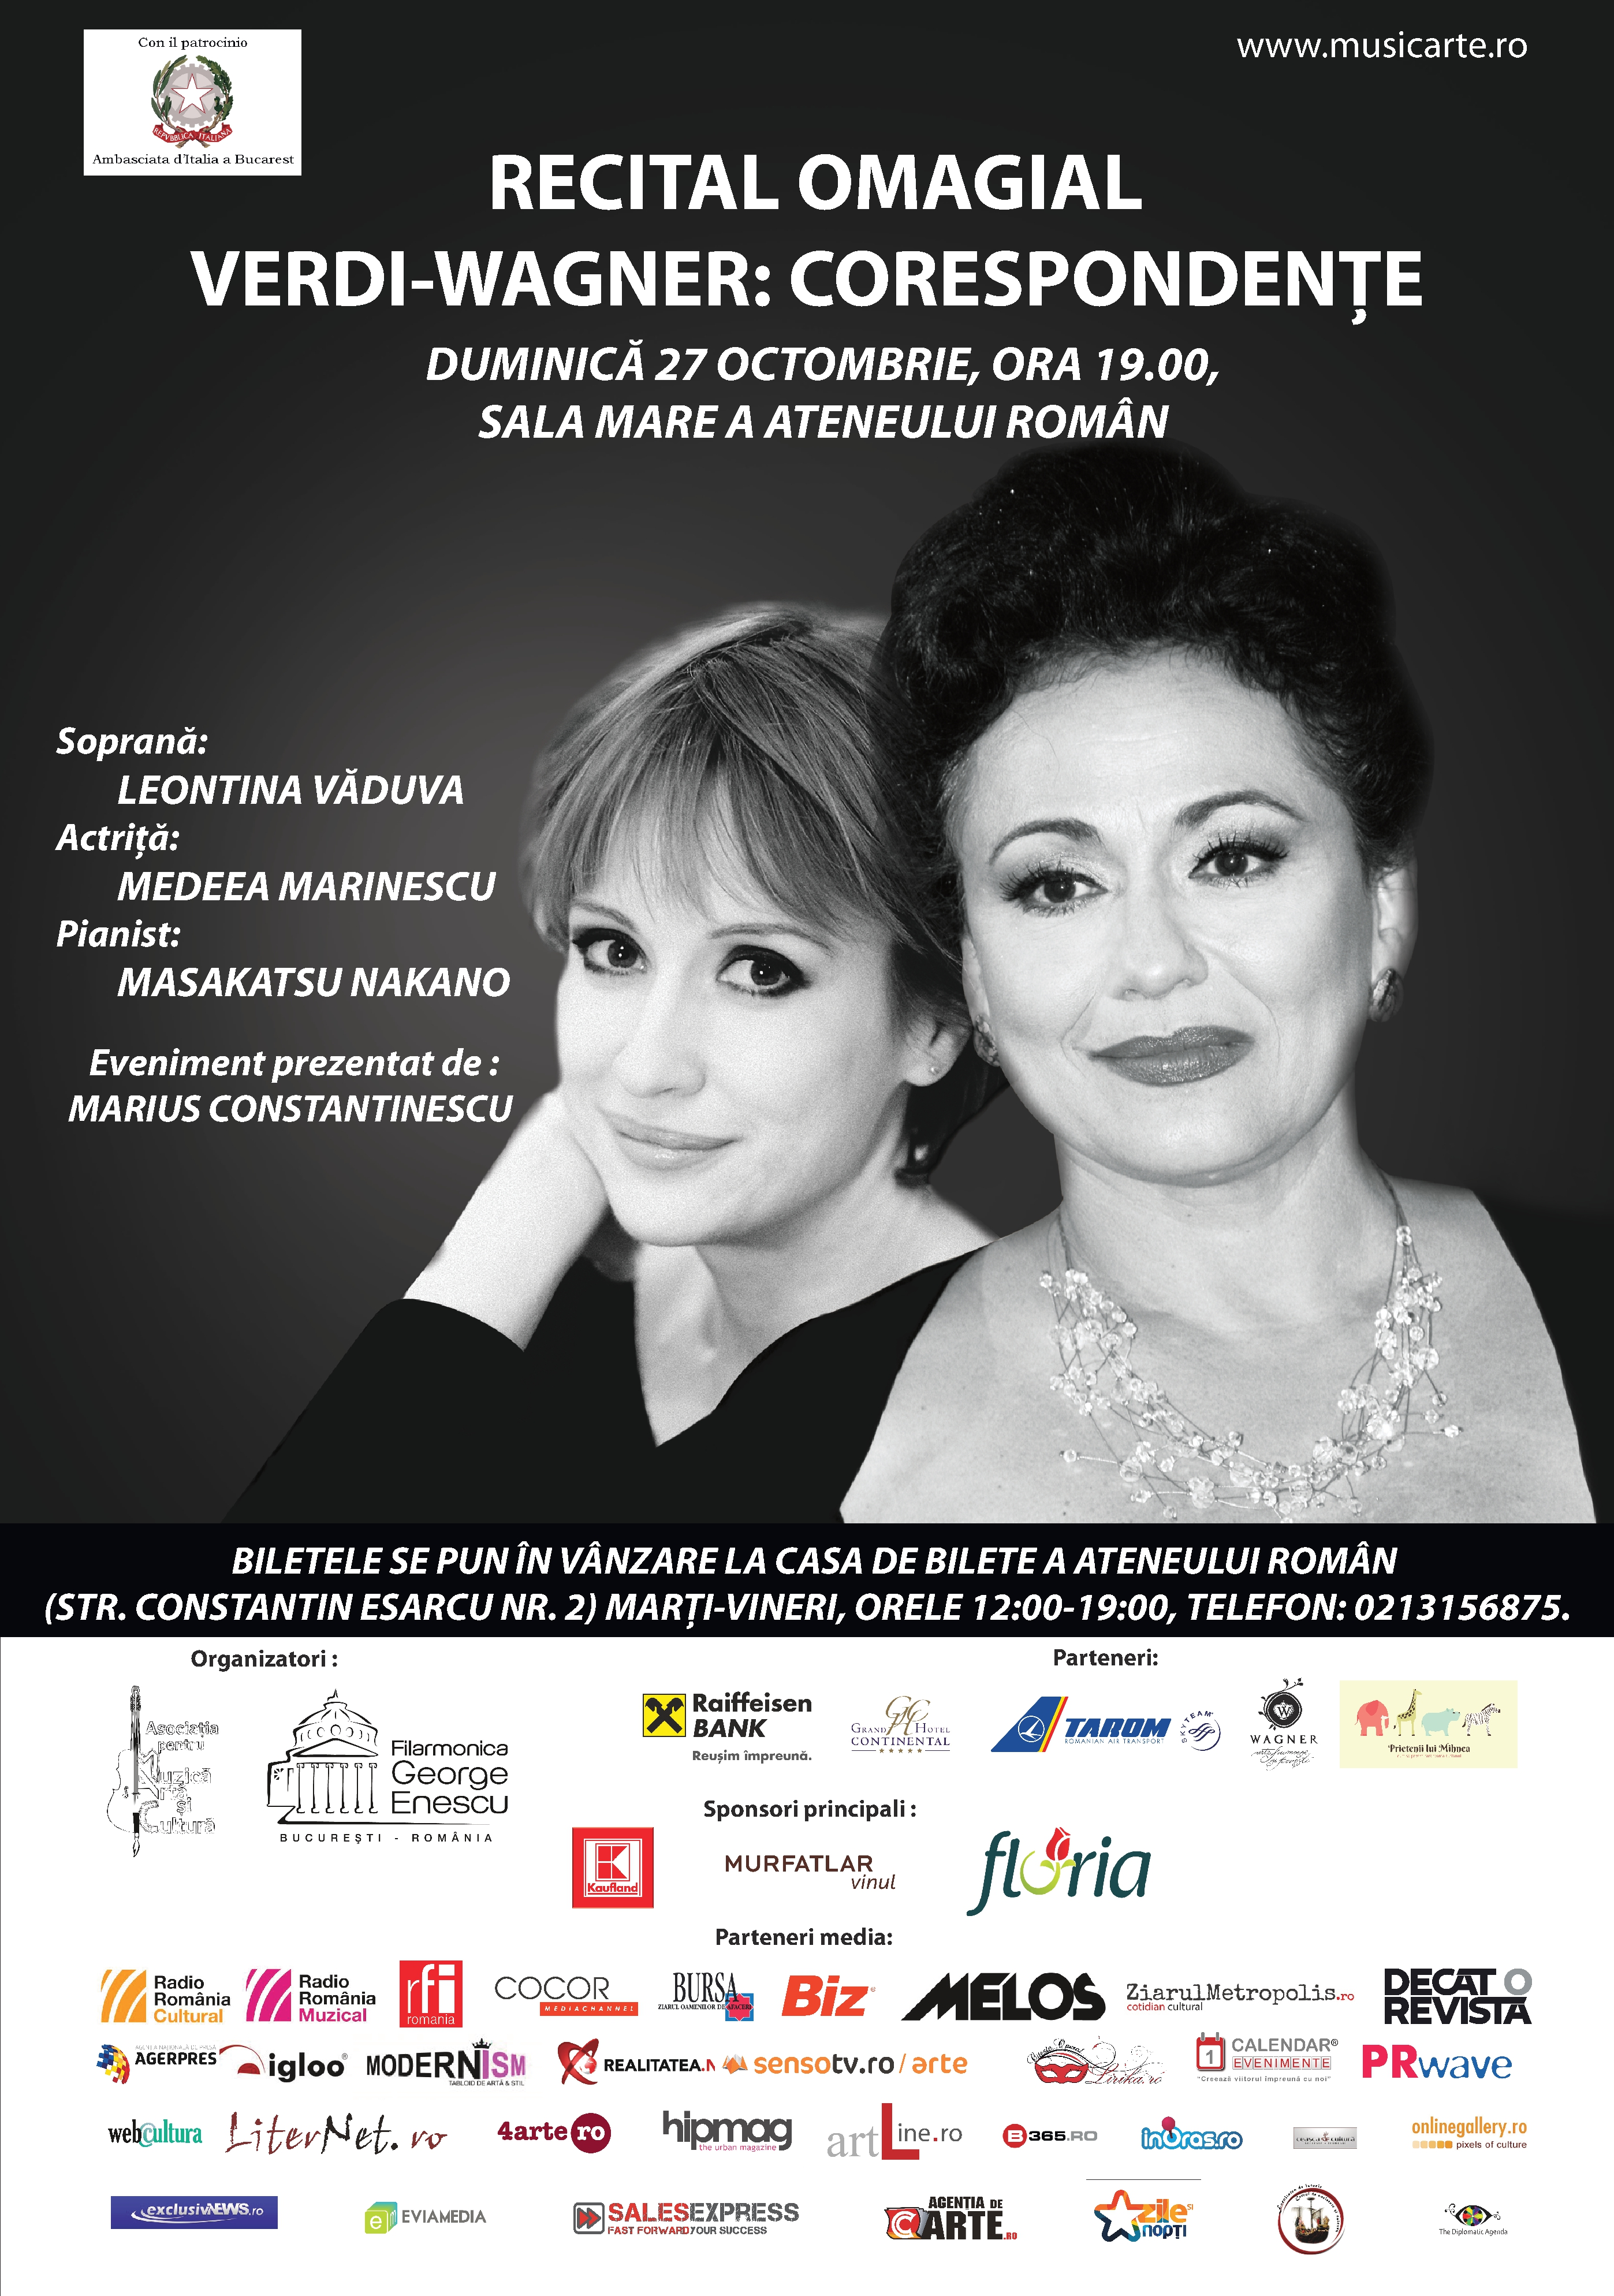 Soprana Leontina Văduva și actrița Medeea Marinescu, Verdi-Wagner: Corespondențe @ Ateneul Român